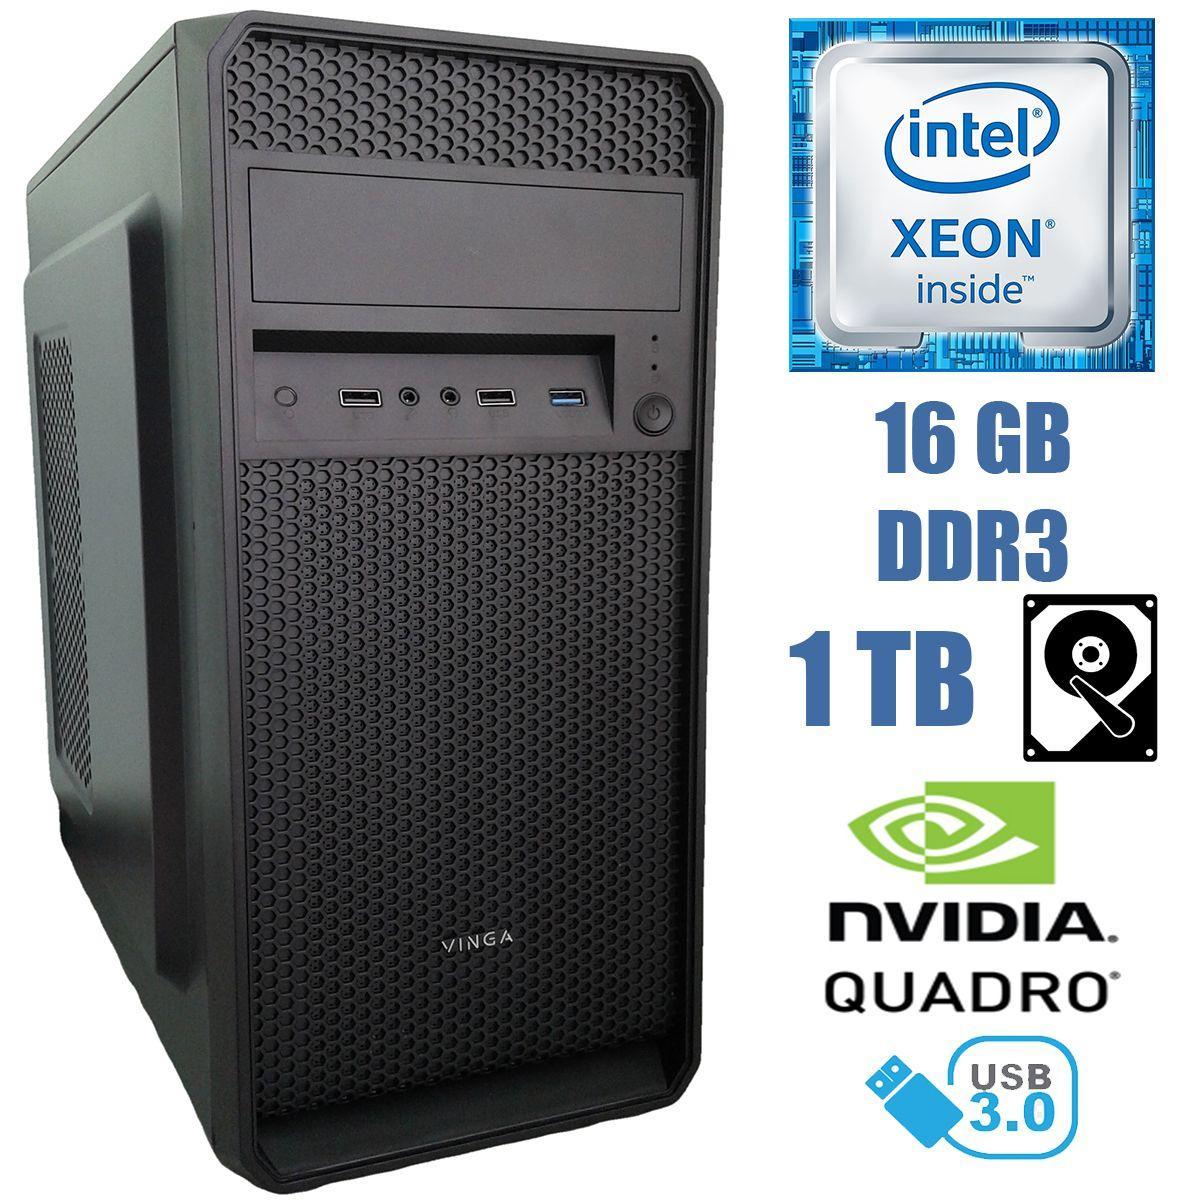 Металический MiDiTower / Intel Xeon E5-2667 (6 (12) ядер по 2.9-3.5GHz) / 16 GB DDR3 / 1TB HDD / nVidia Quadro K2000 2GB / 800W